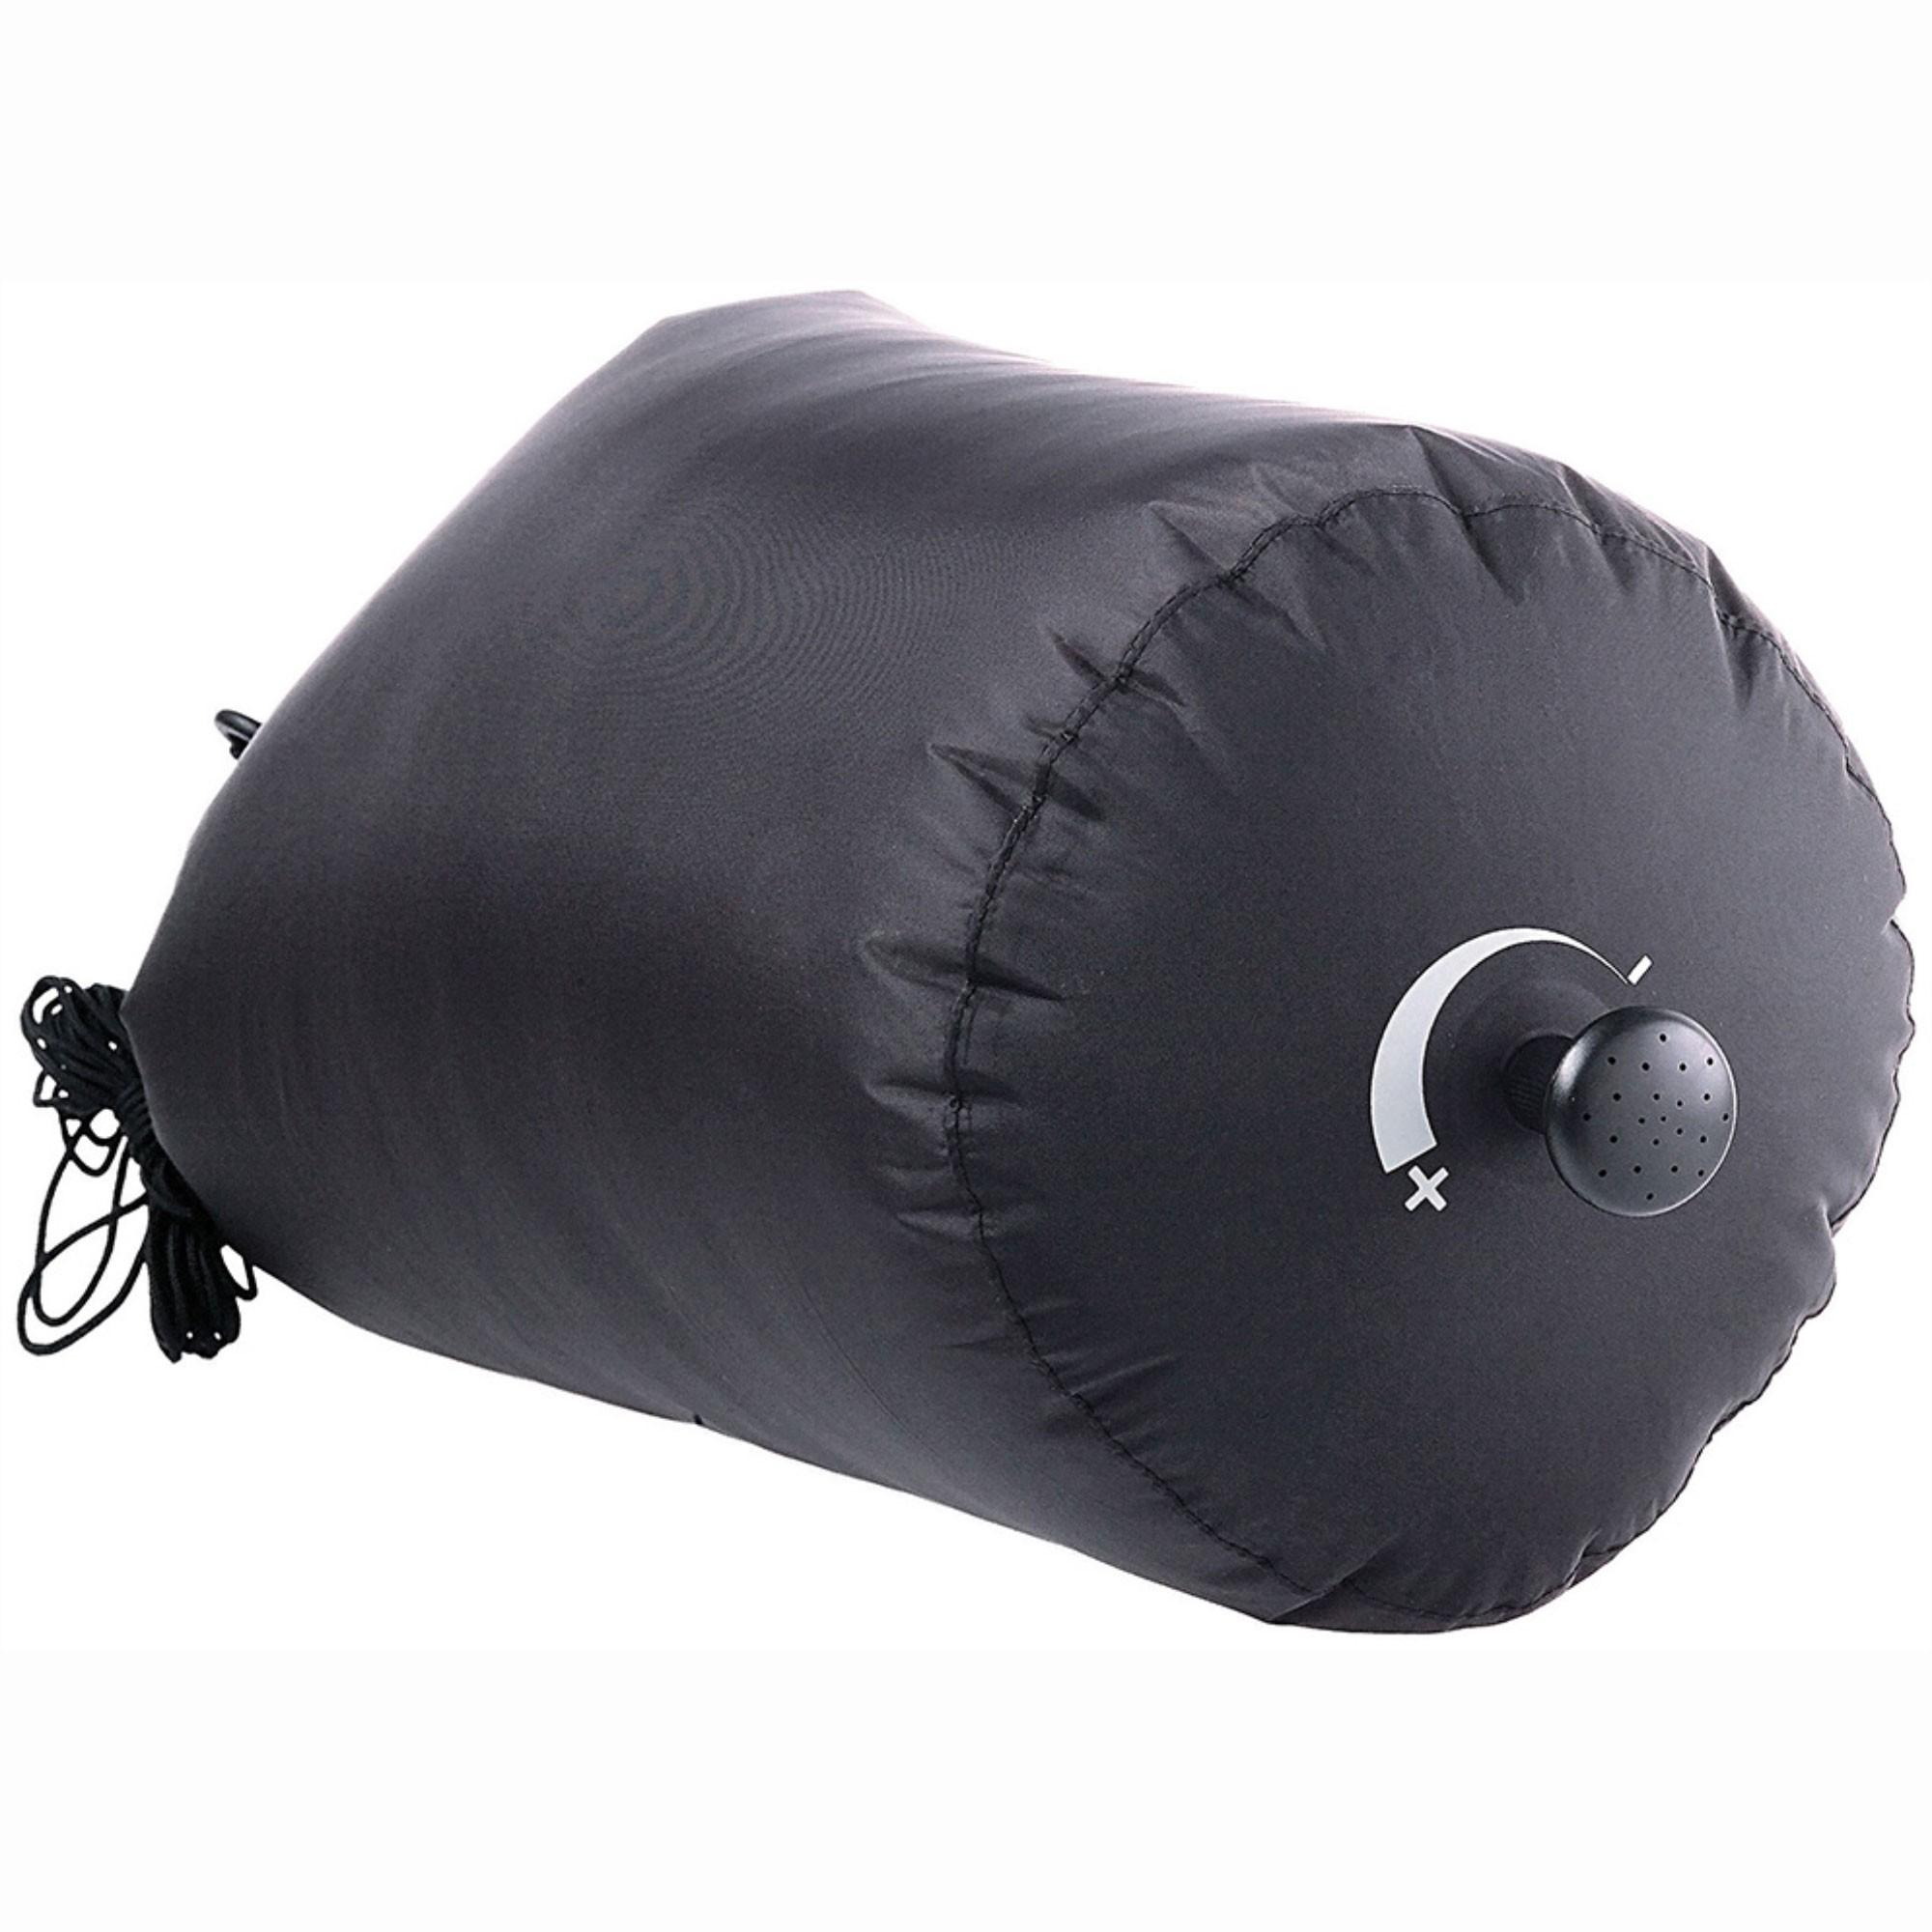 Sea to Summit Pocket Shower - Black